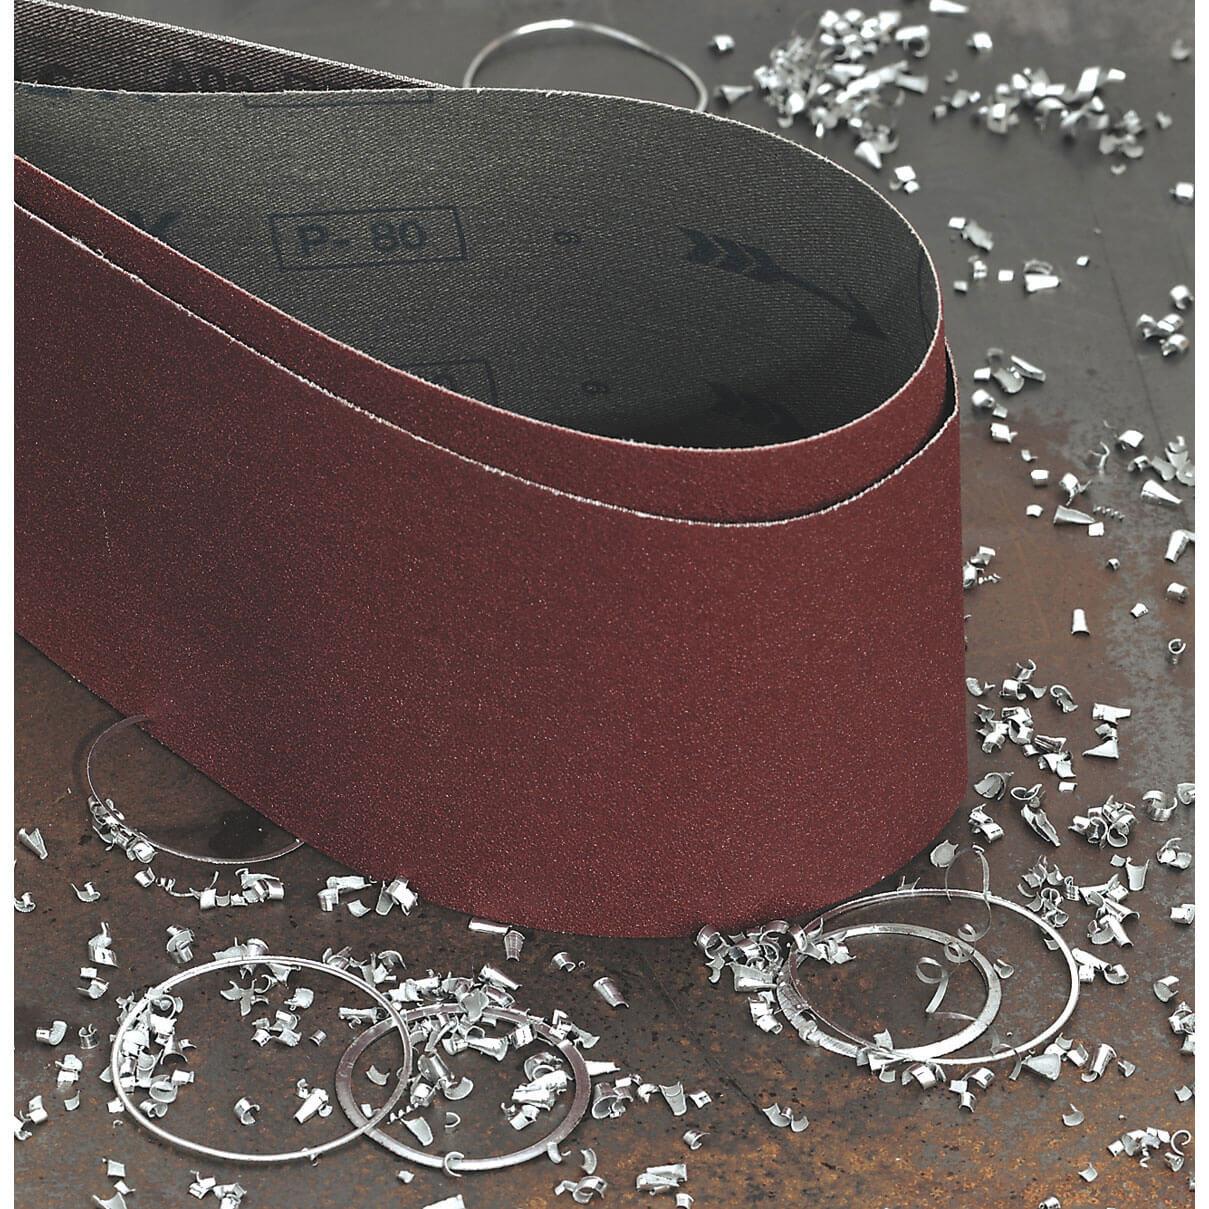 Image of Sealey 100mm x 1220mm Sanding Belt 100mm x 1220mm 80g Pack of 1